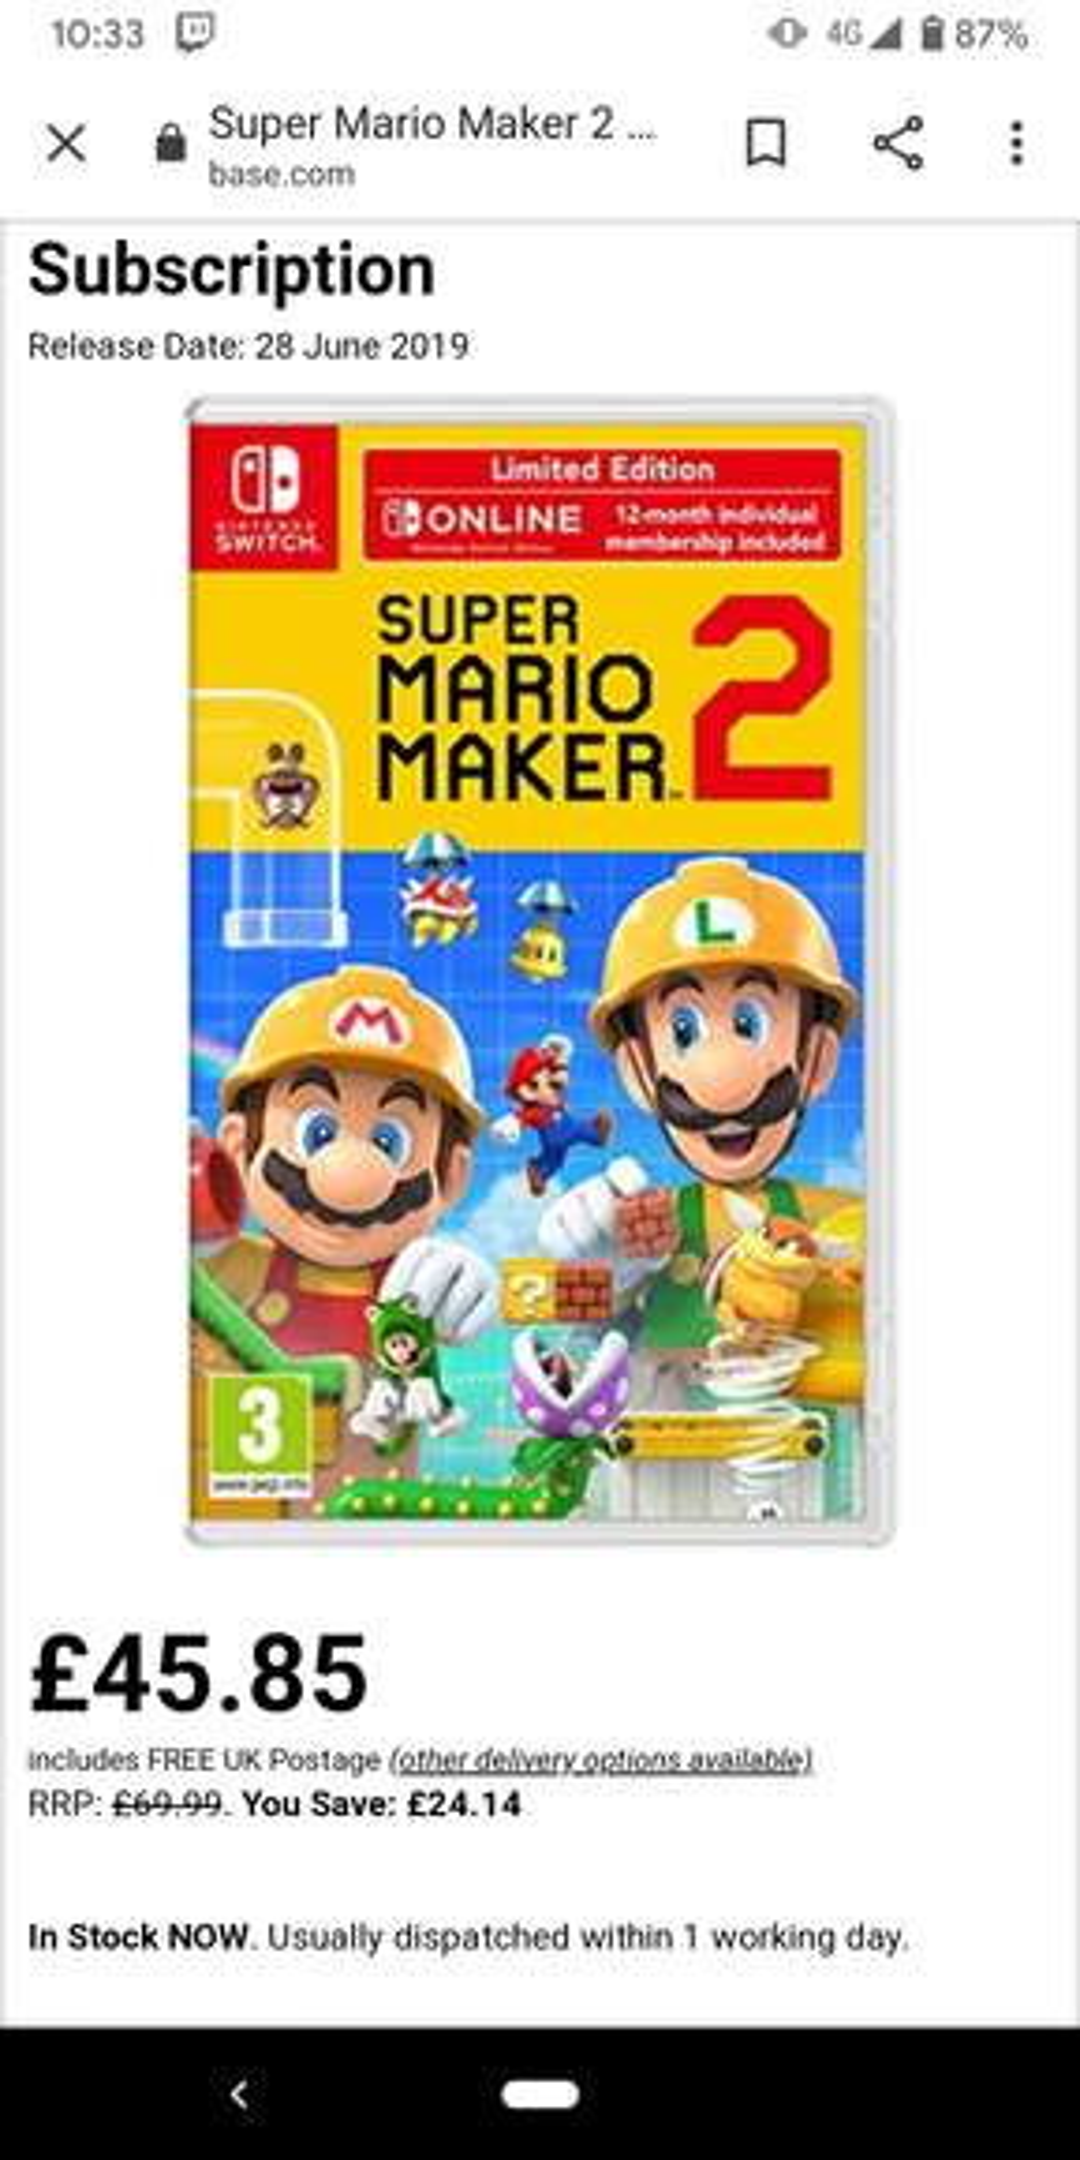 Super Mario Maker 2 (Switch) + 1 year Nintendo Switch Online